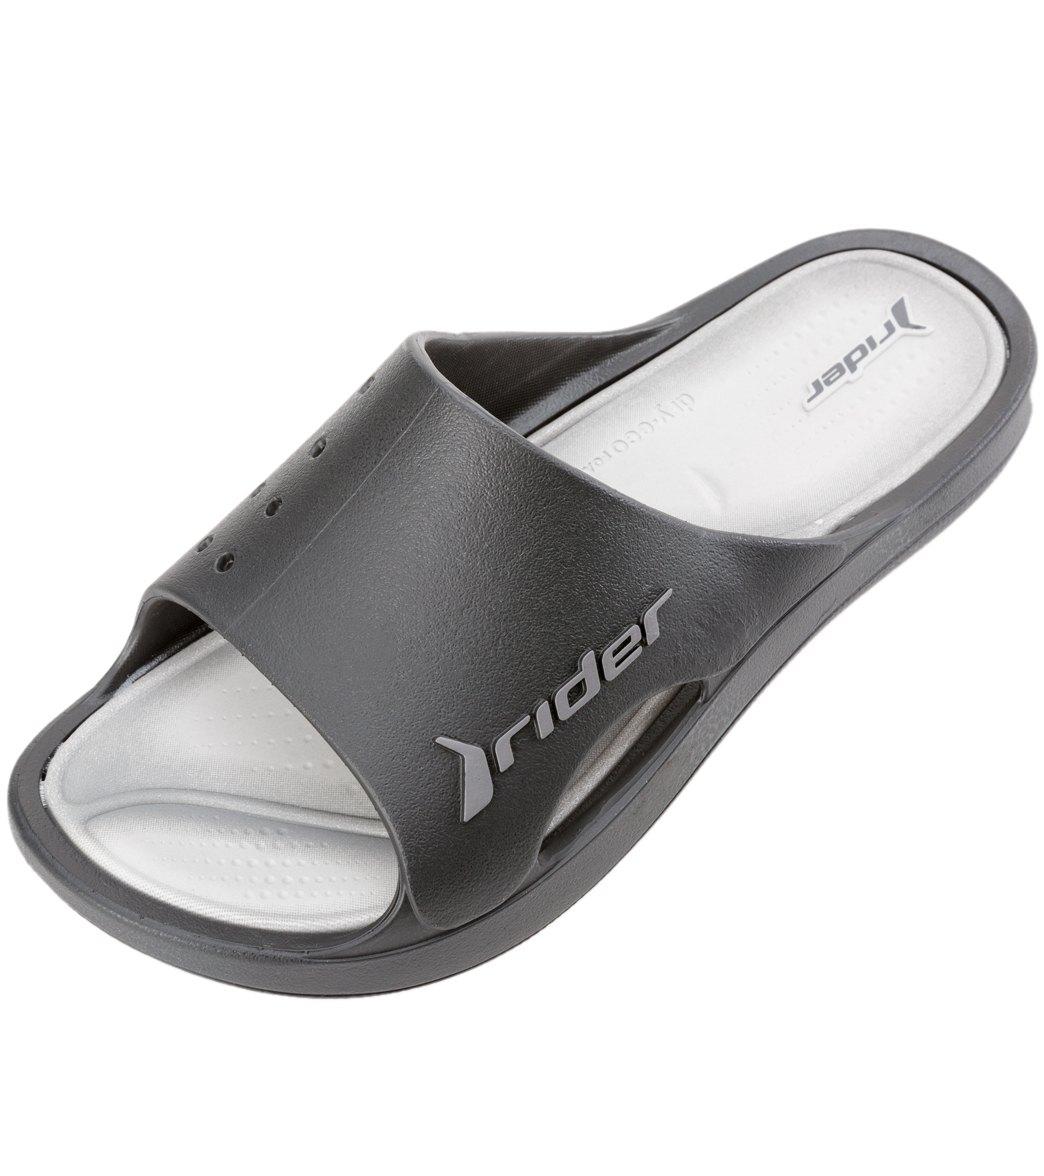 fd29987b3c02 Rider Men s Bay V Slide Sandals at SwimOutlet.com